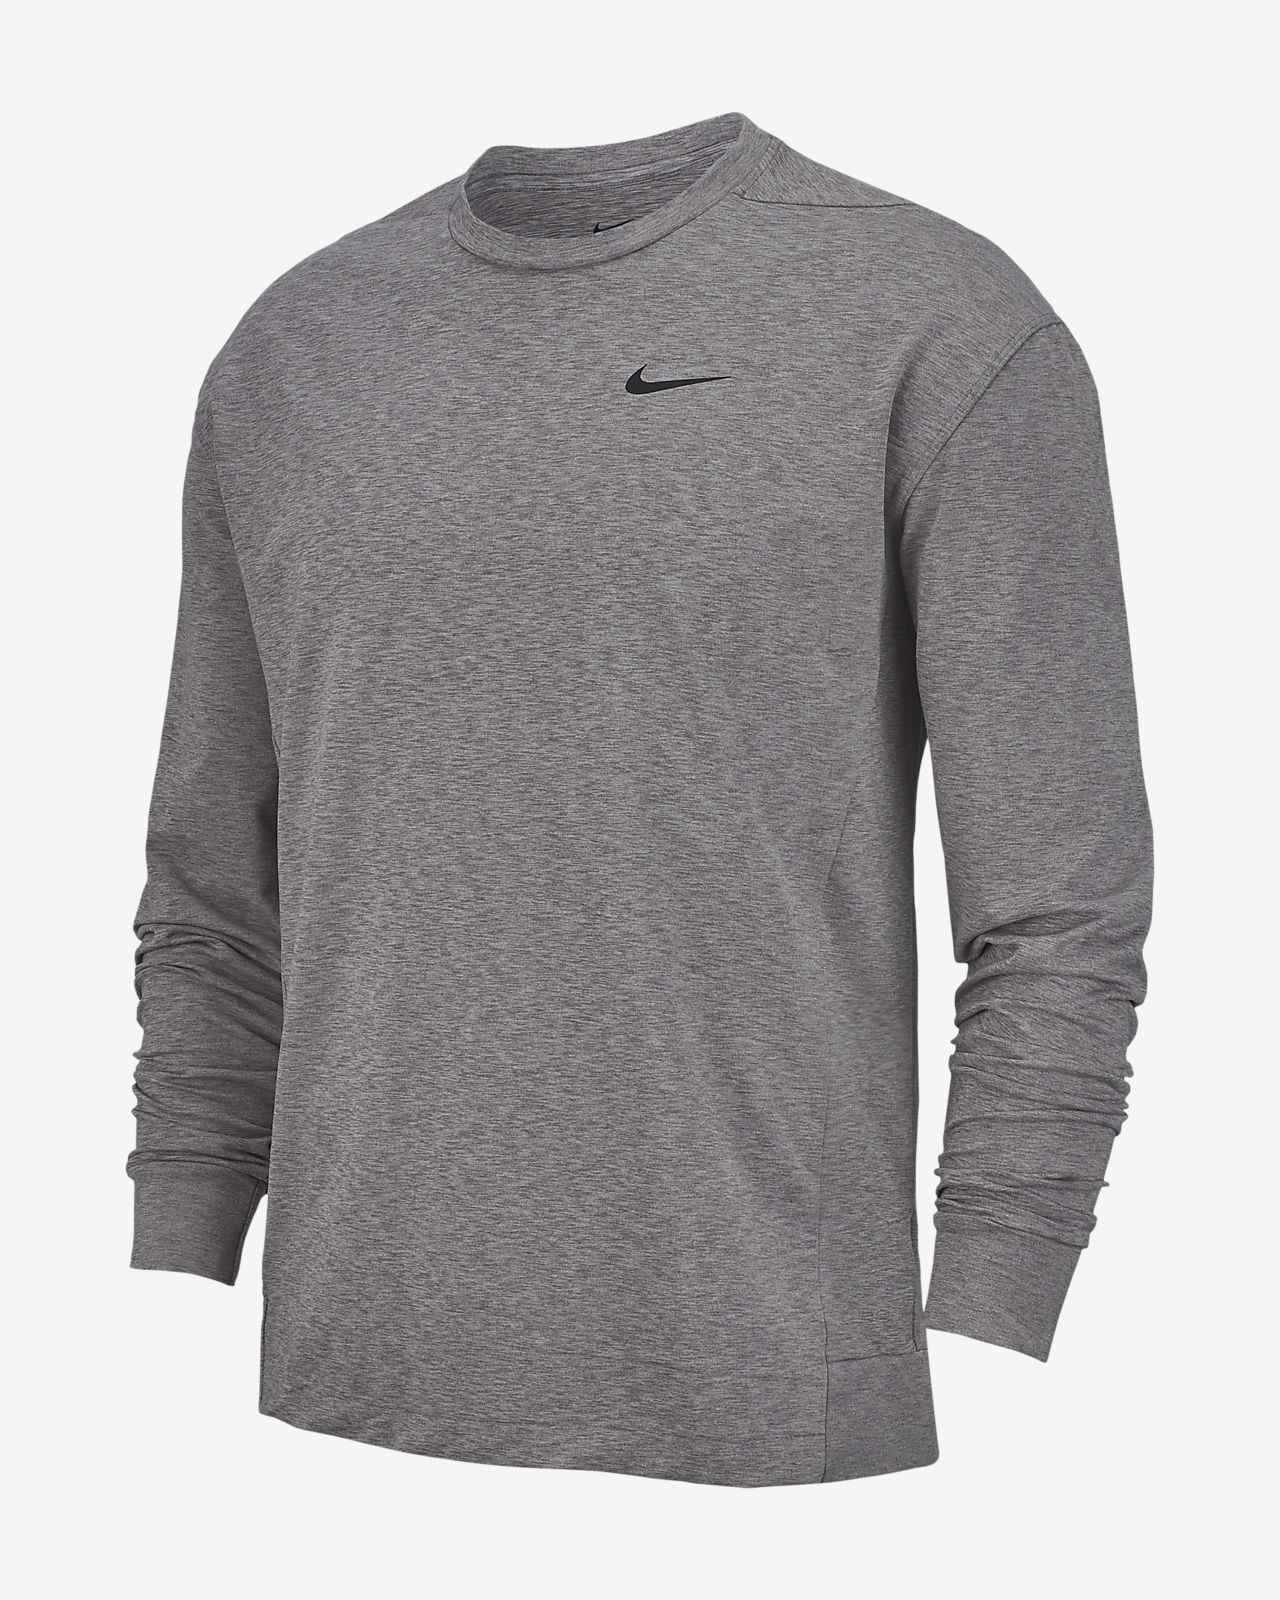 Nike Dri FIT Men's Long Sleeve Yoga Training Top